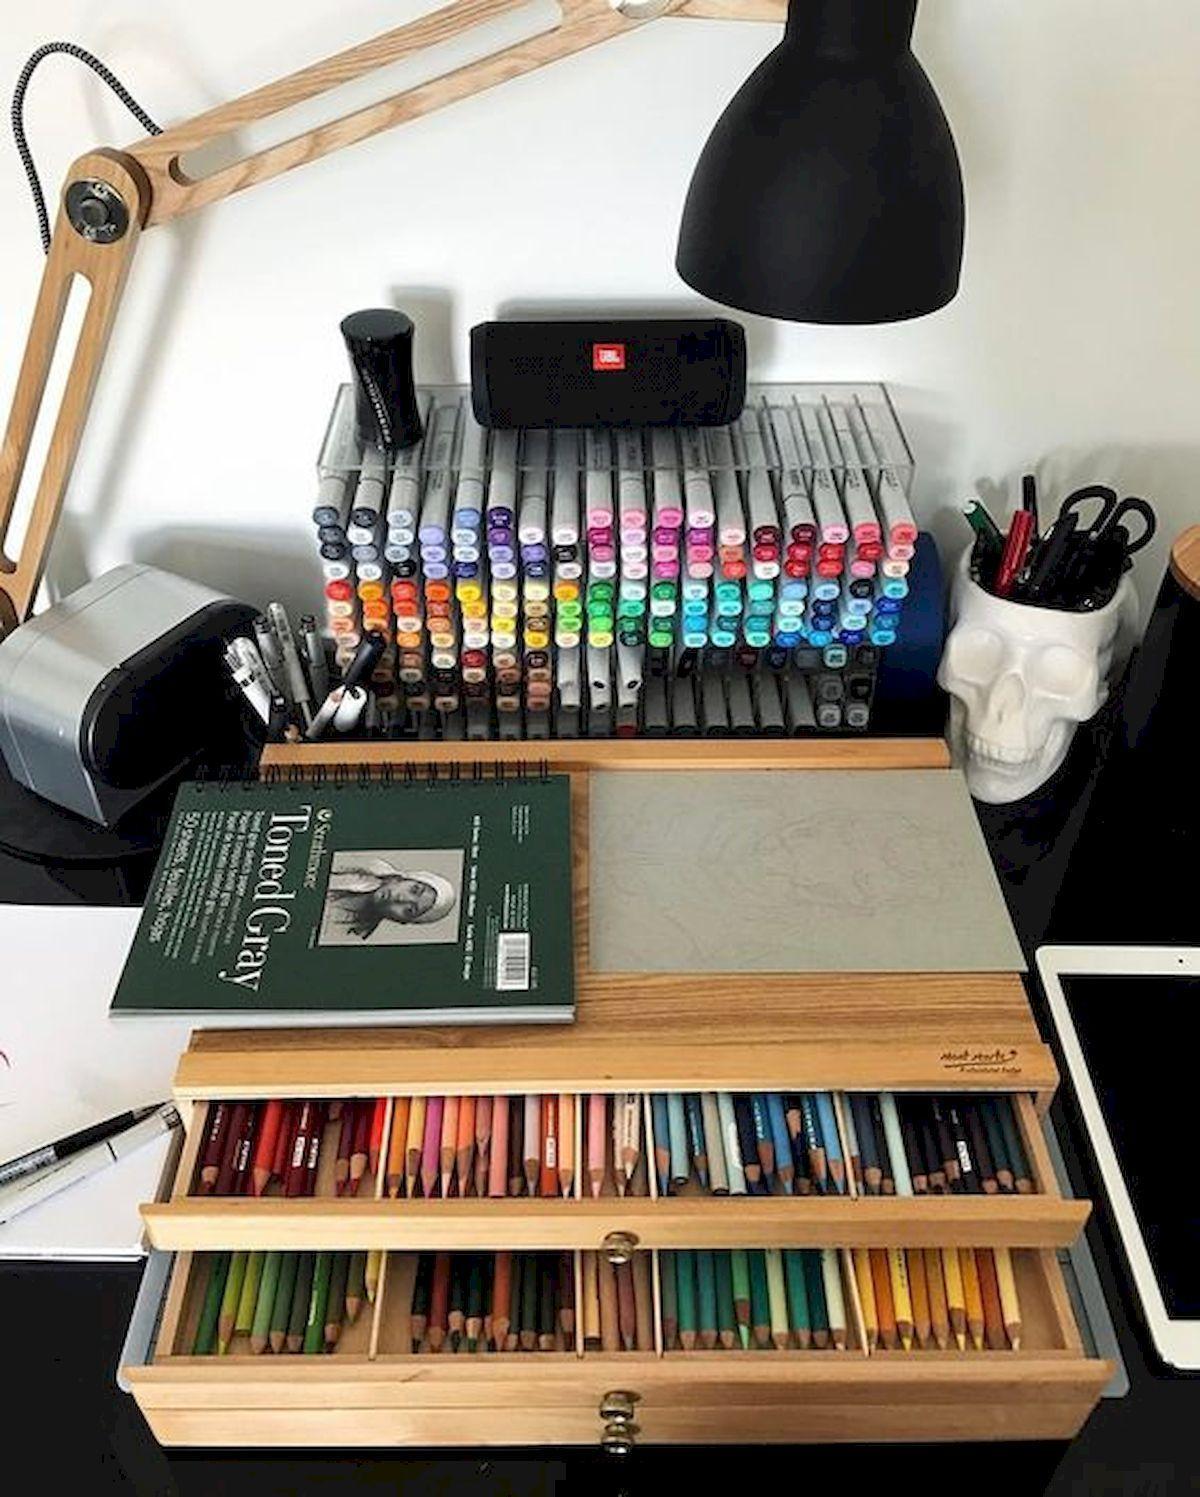 60 Most Popular Art Studio Organization Ideas and Decor (1 images